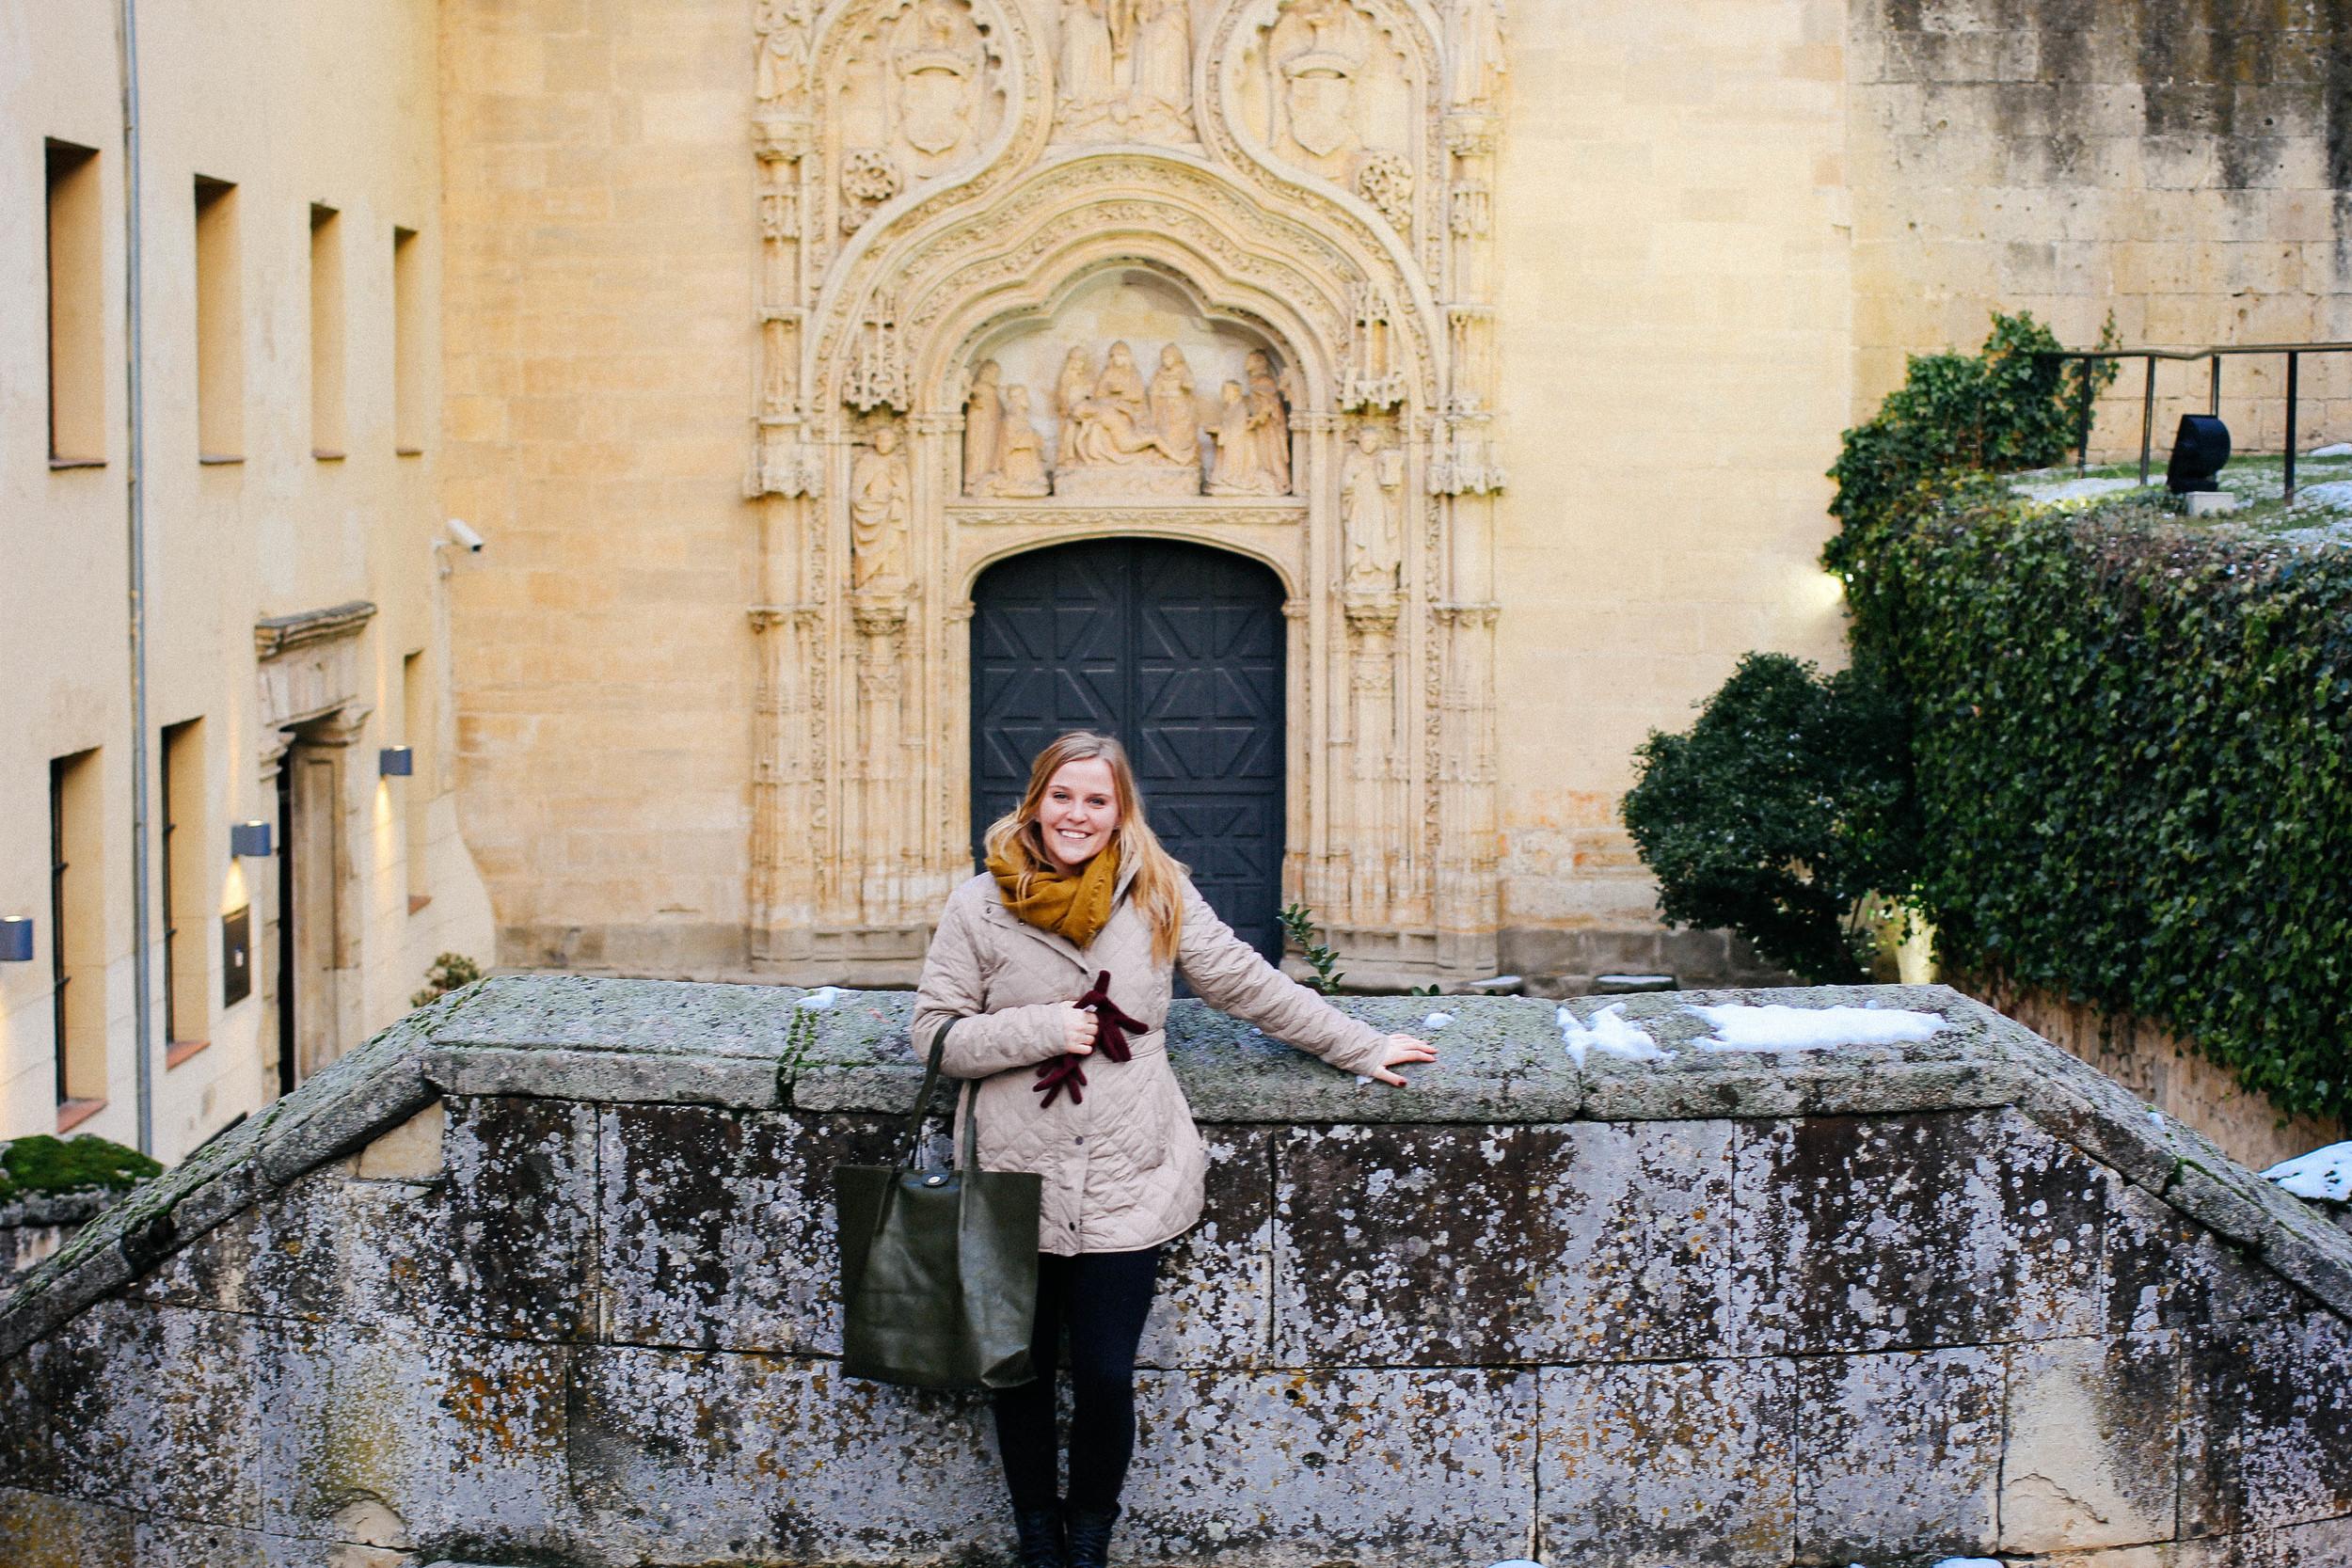 Segovia_Feb2015-1.jpg